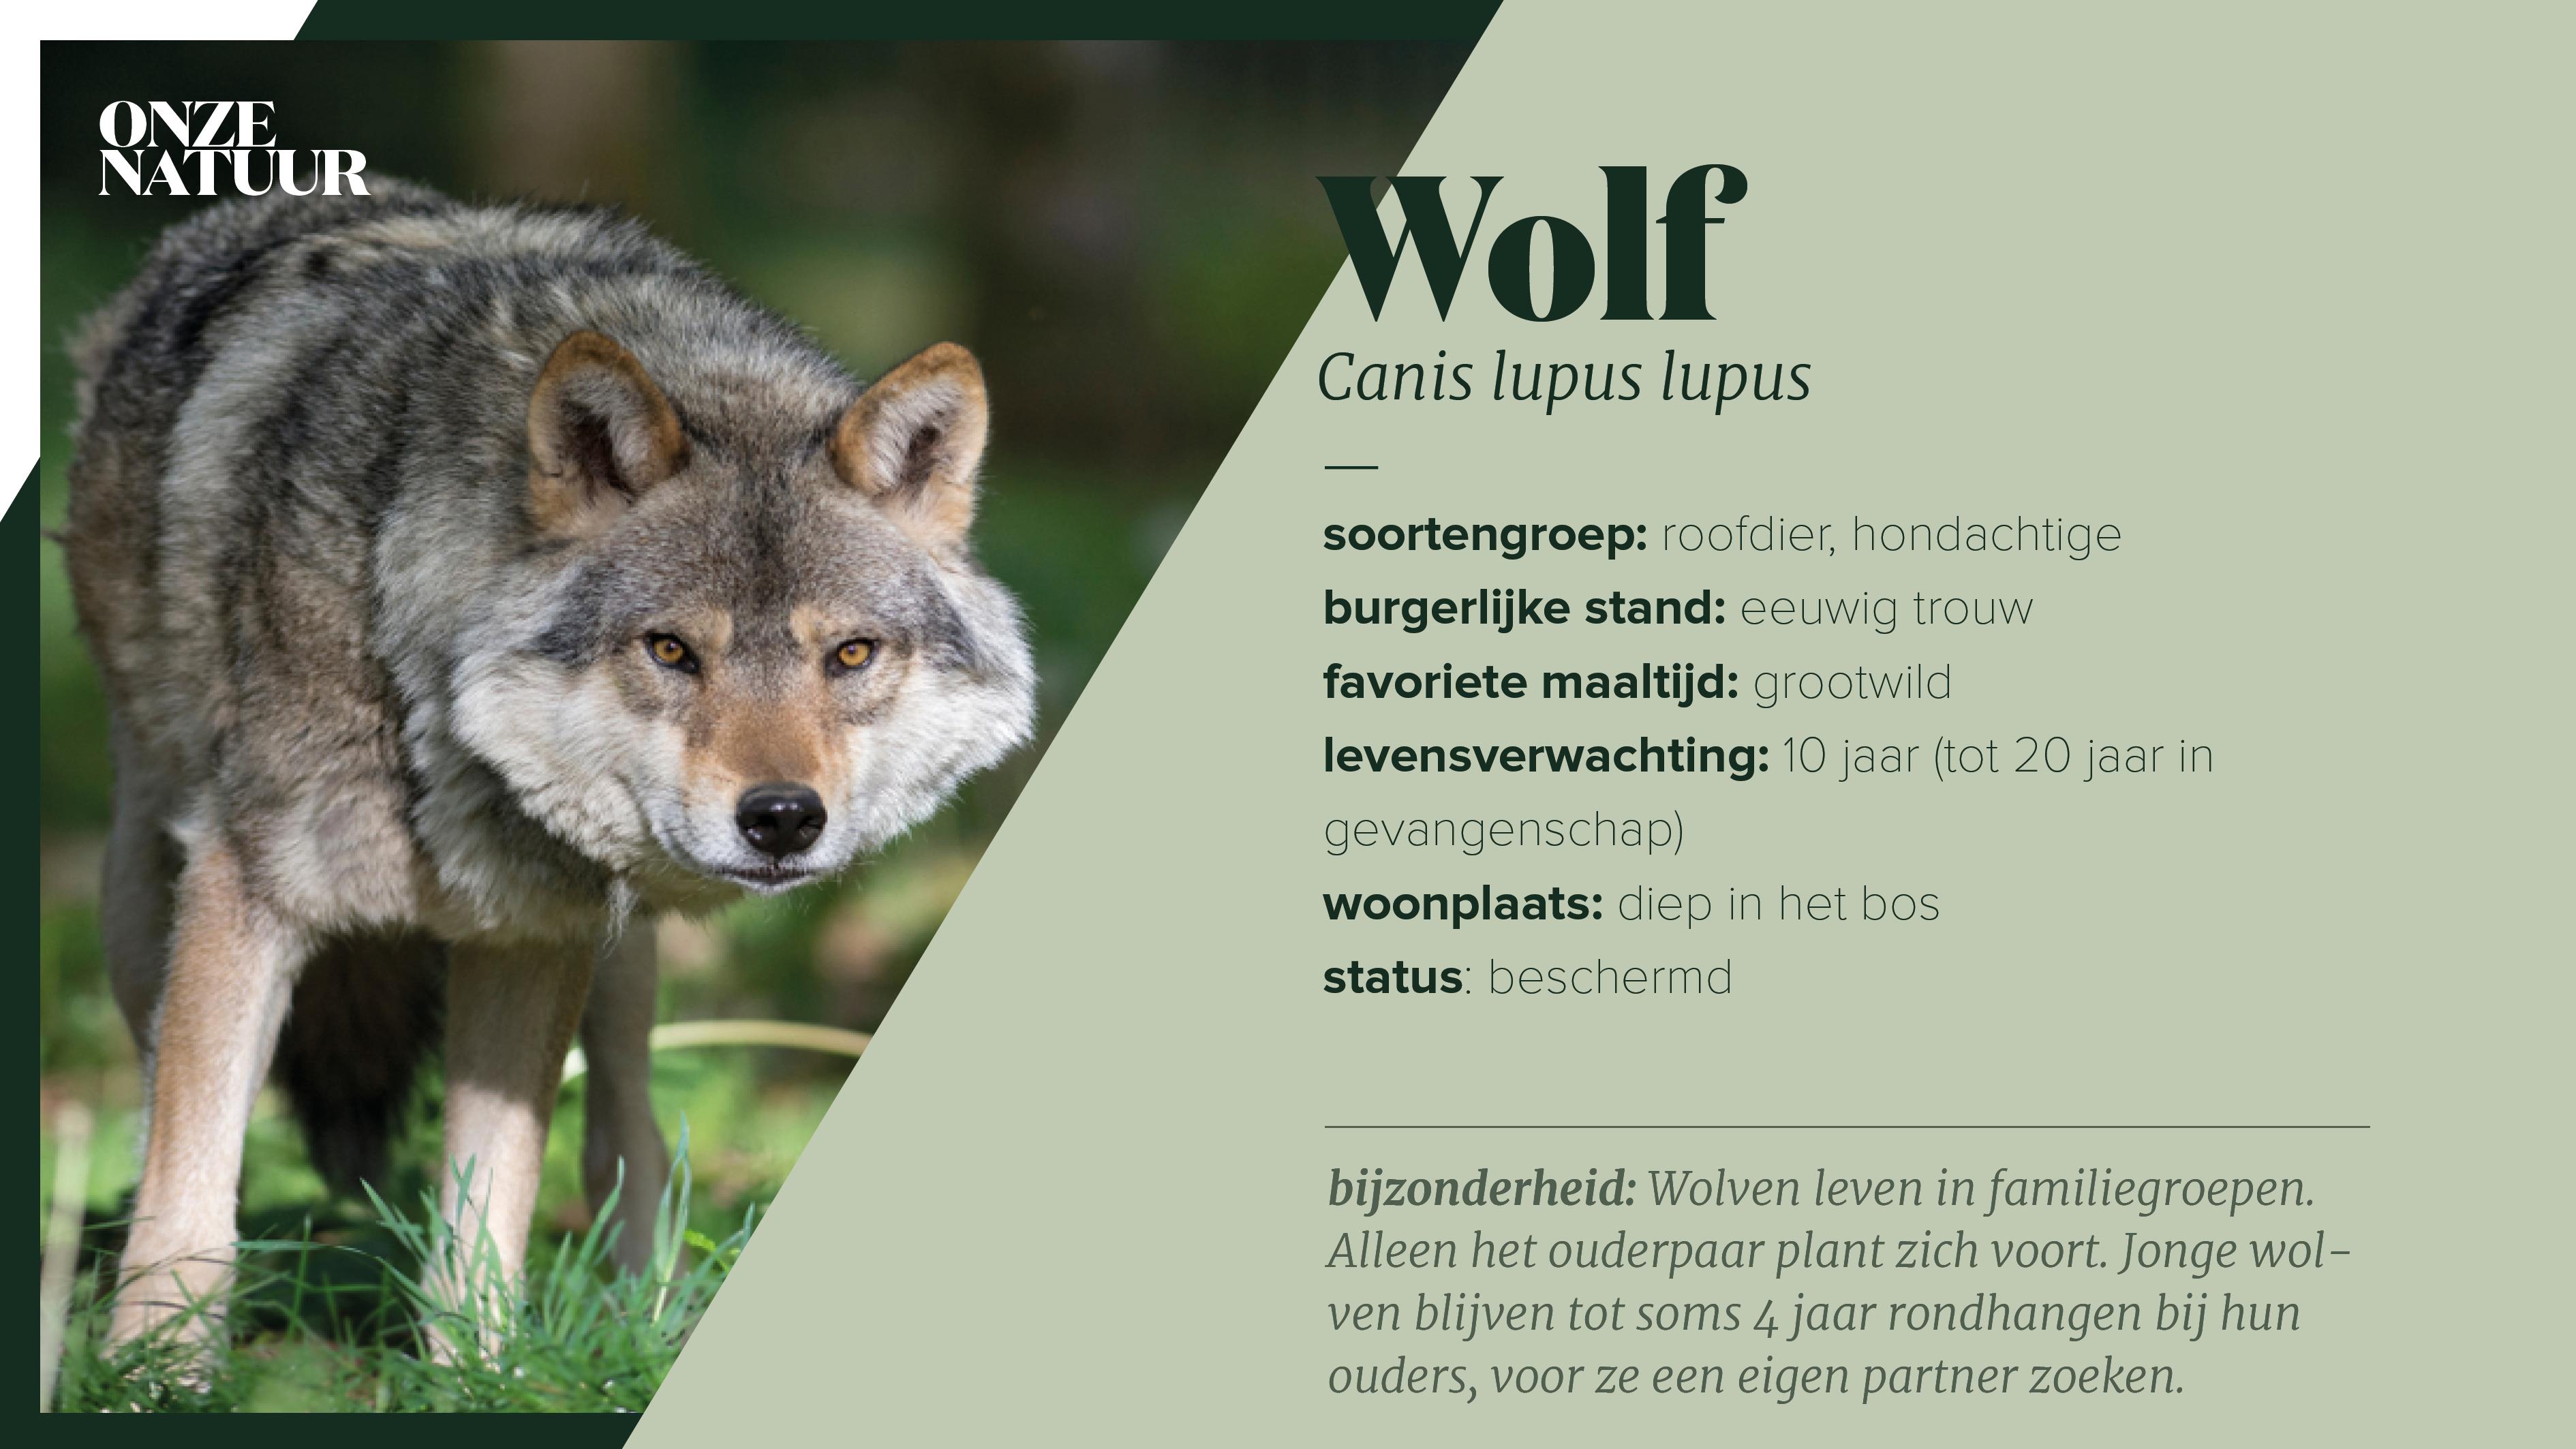 Alles over de wolf